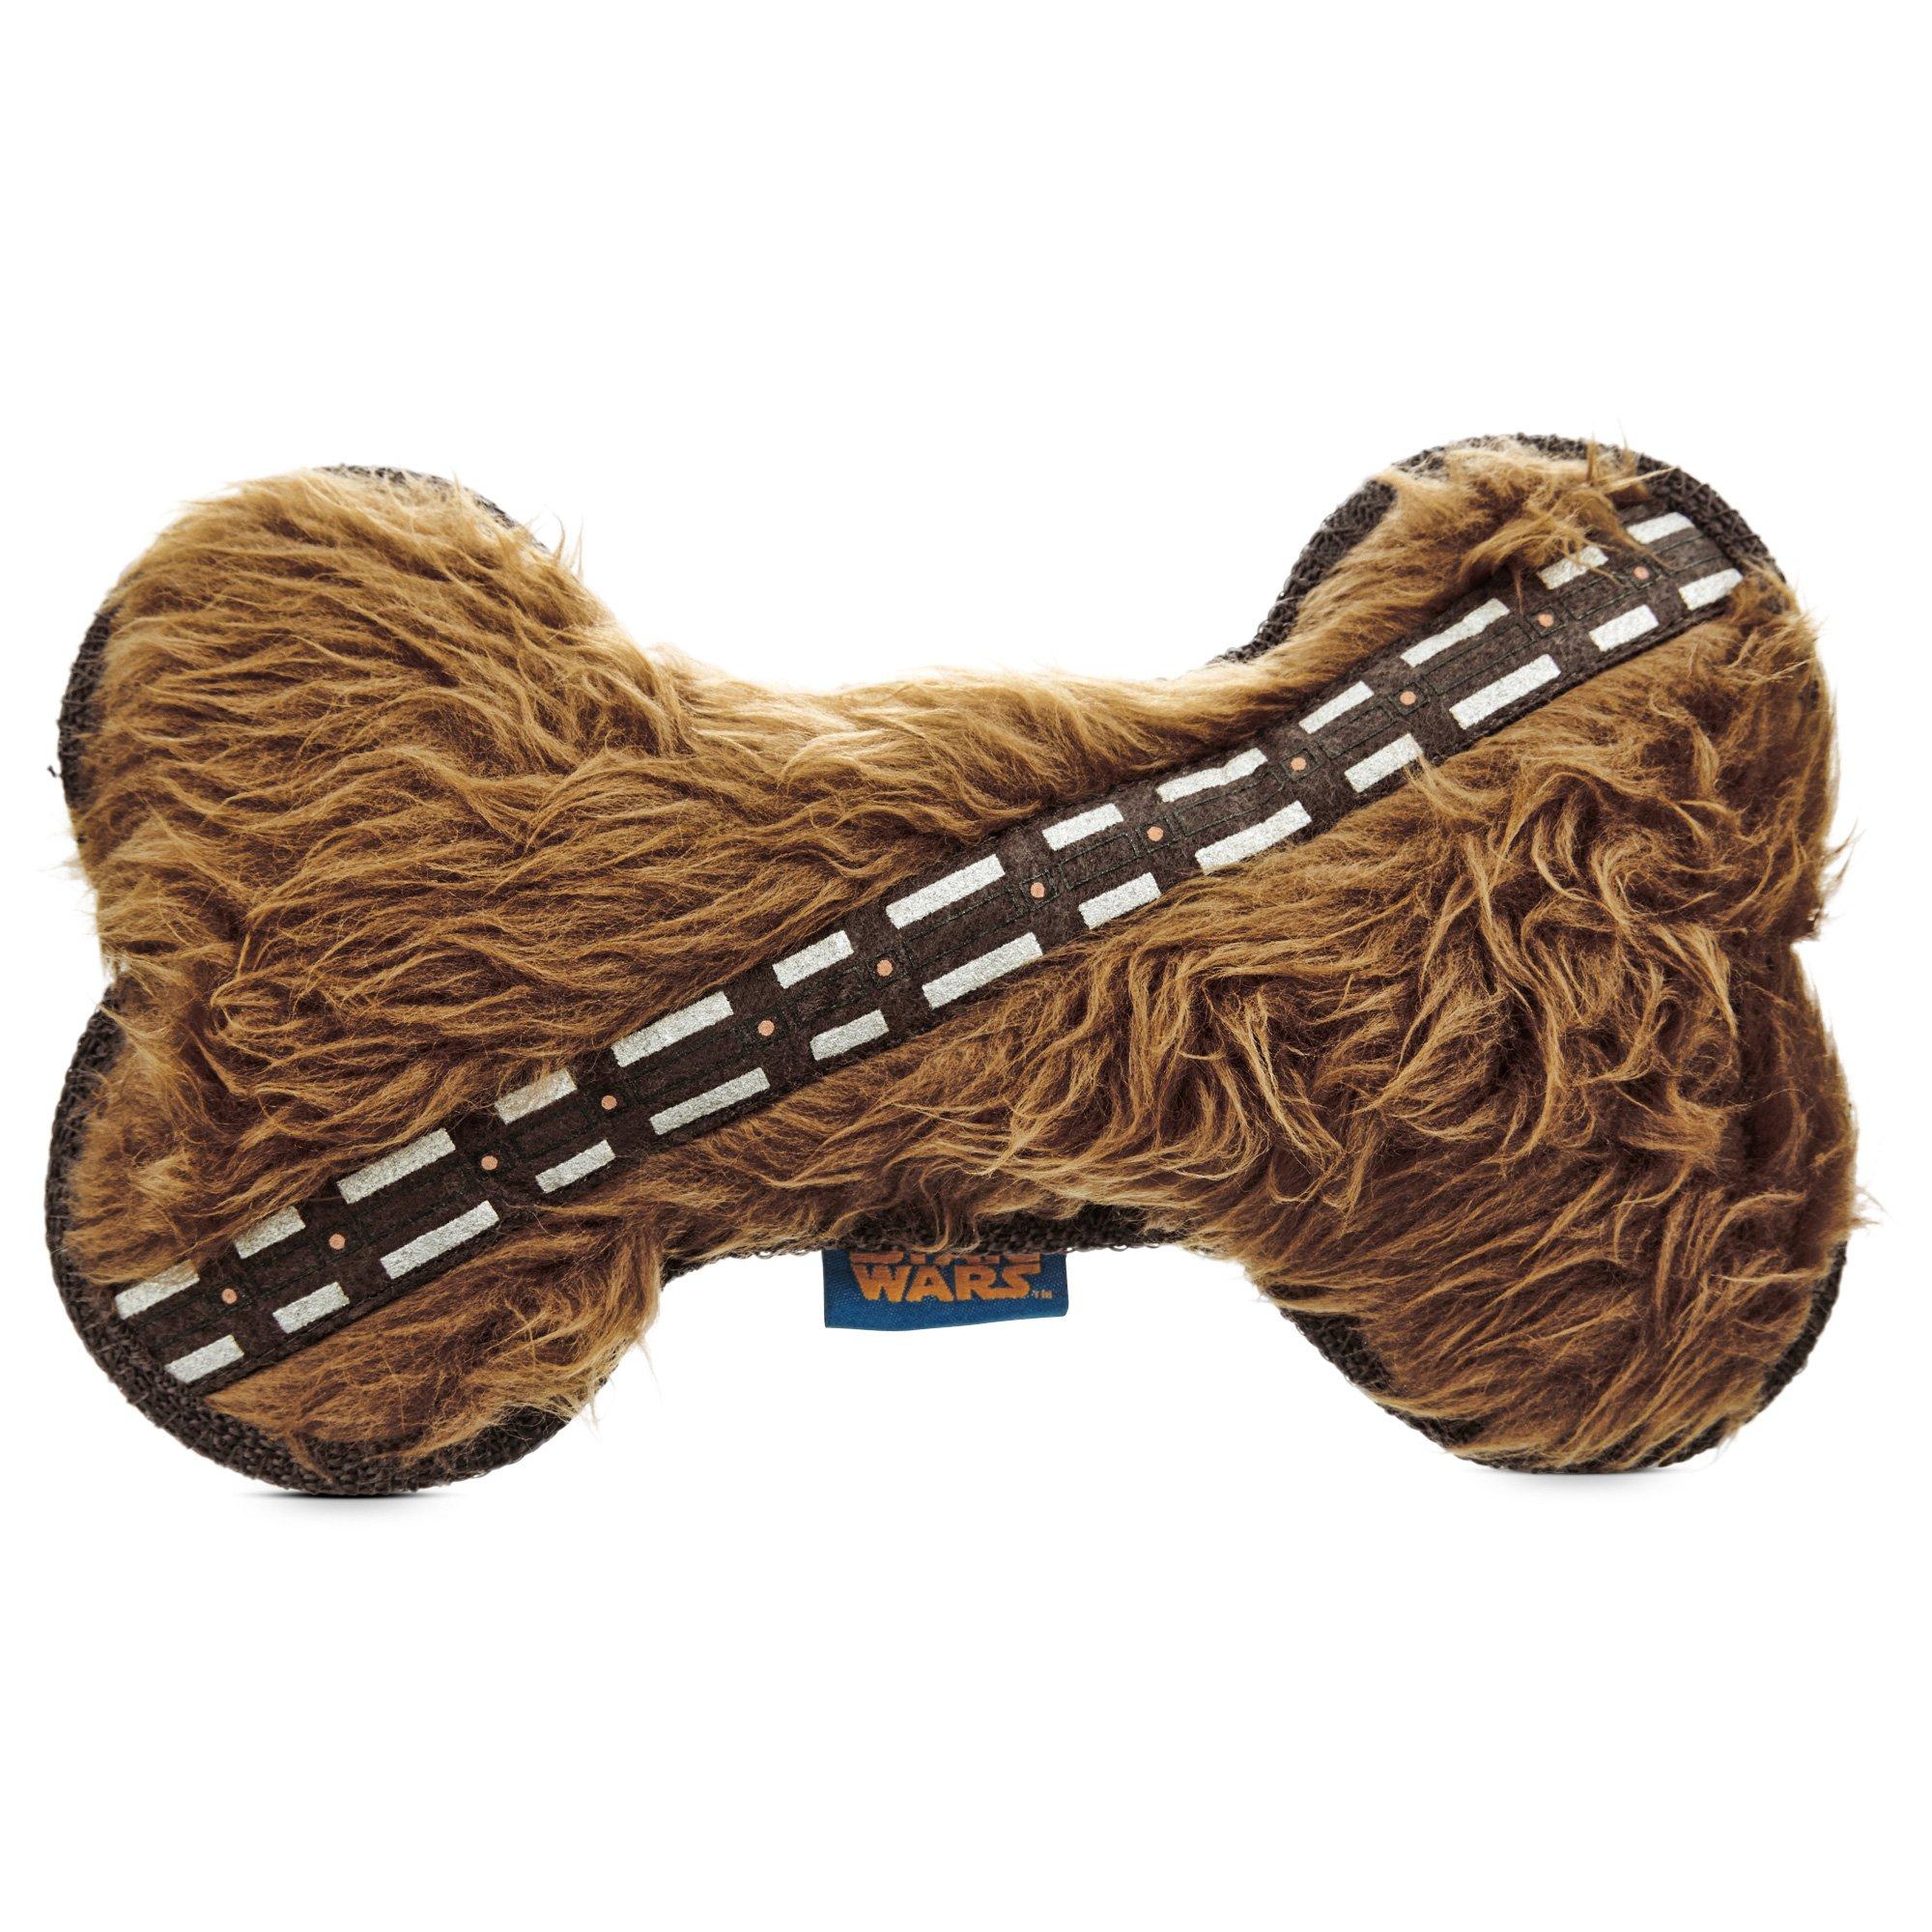 STAR WARS Chewie Bone Dog Toy